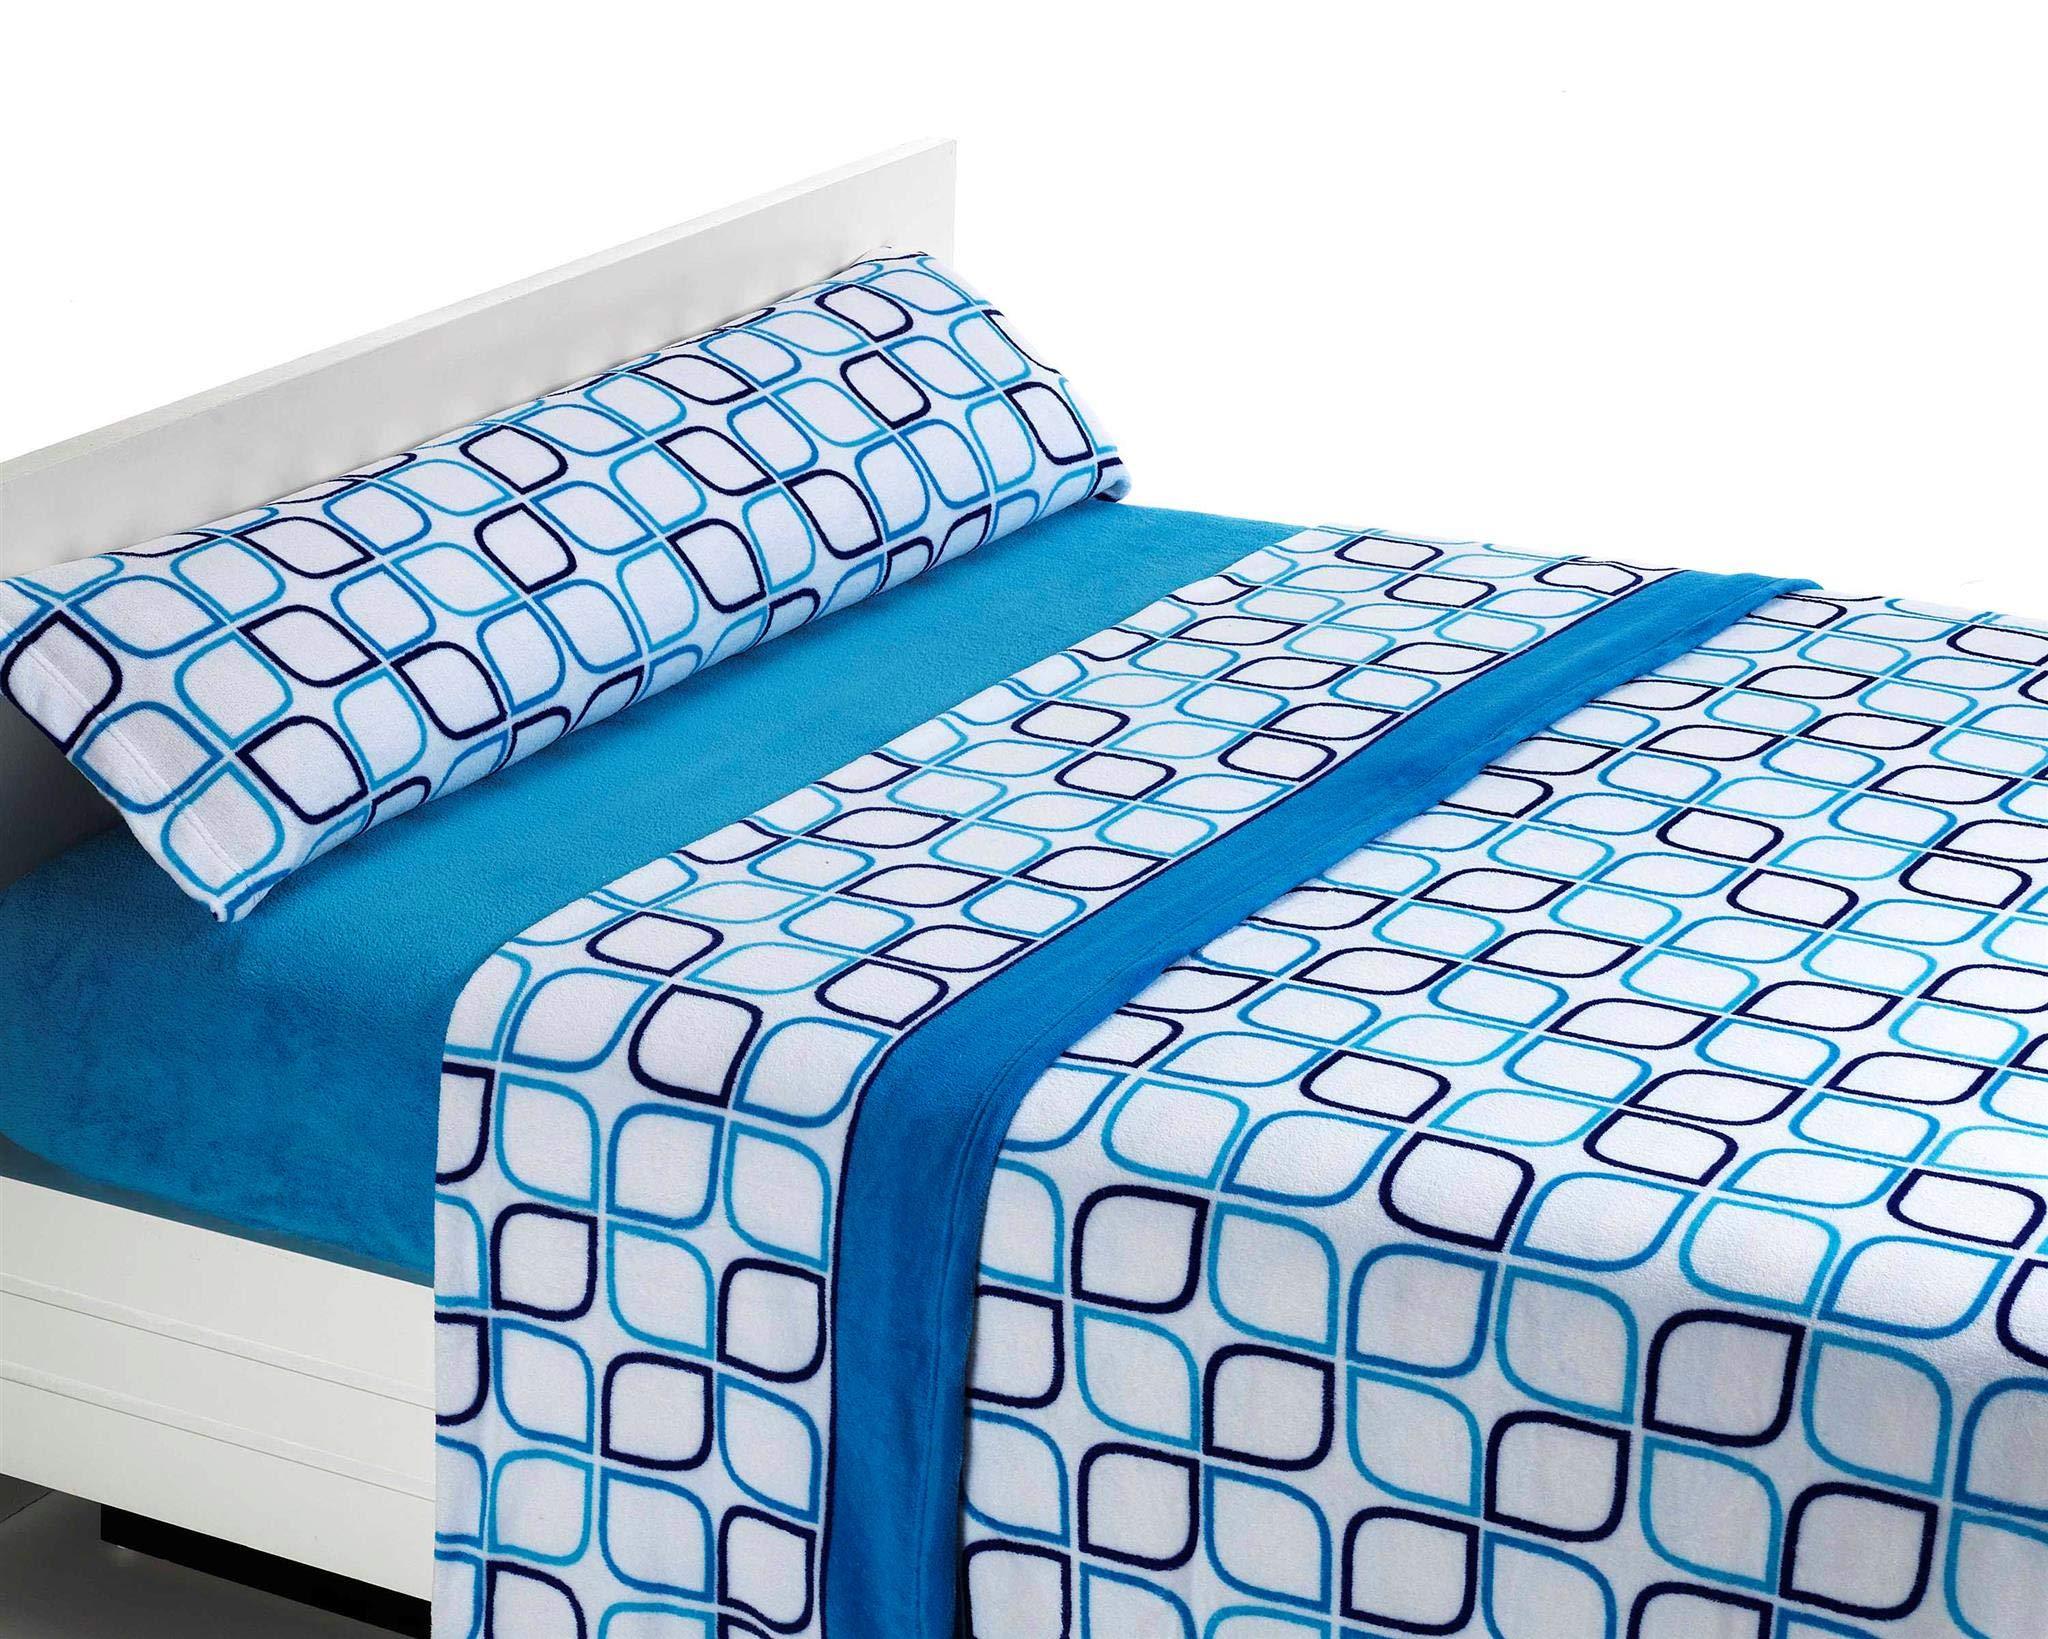 Juego de sábanas de coralina Spring - Azul, Cama 200